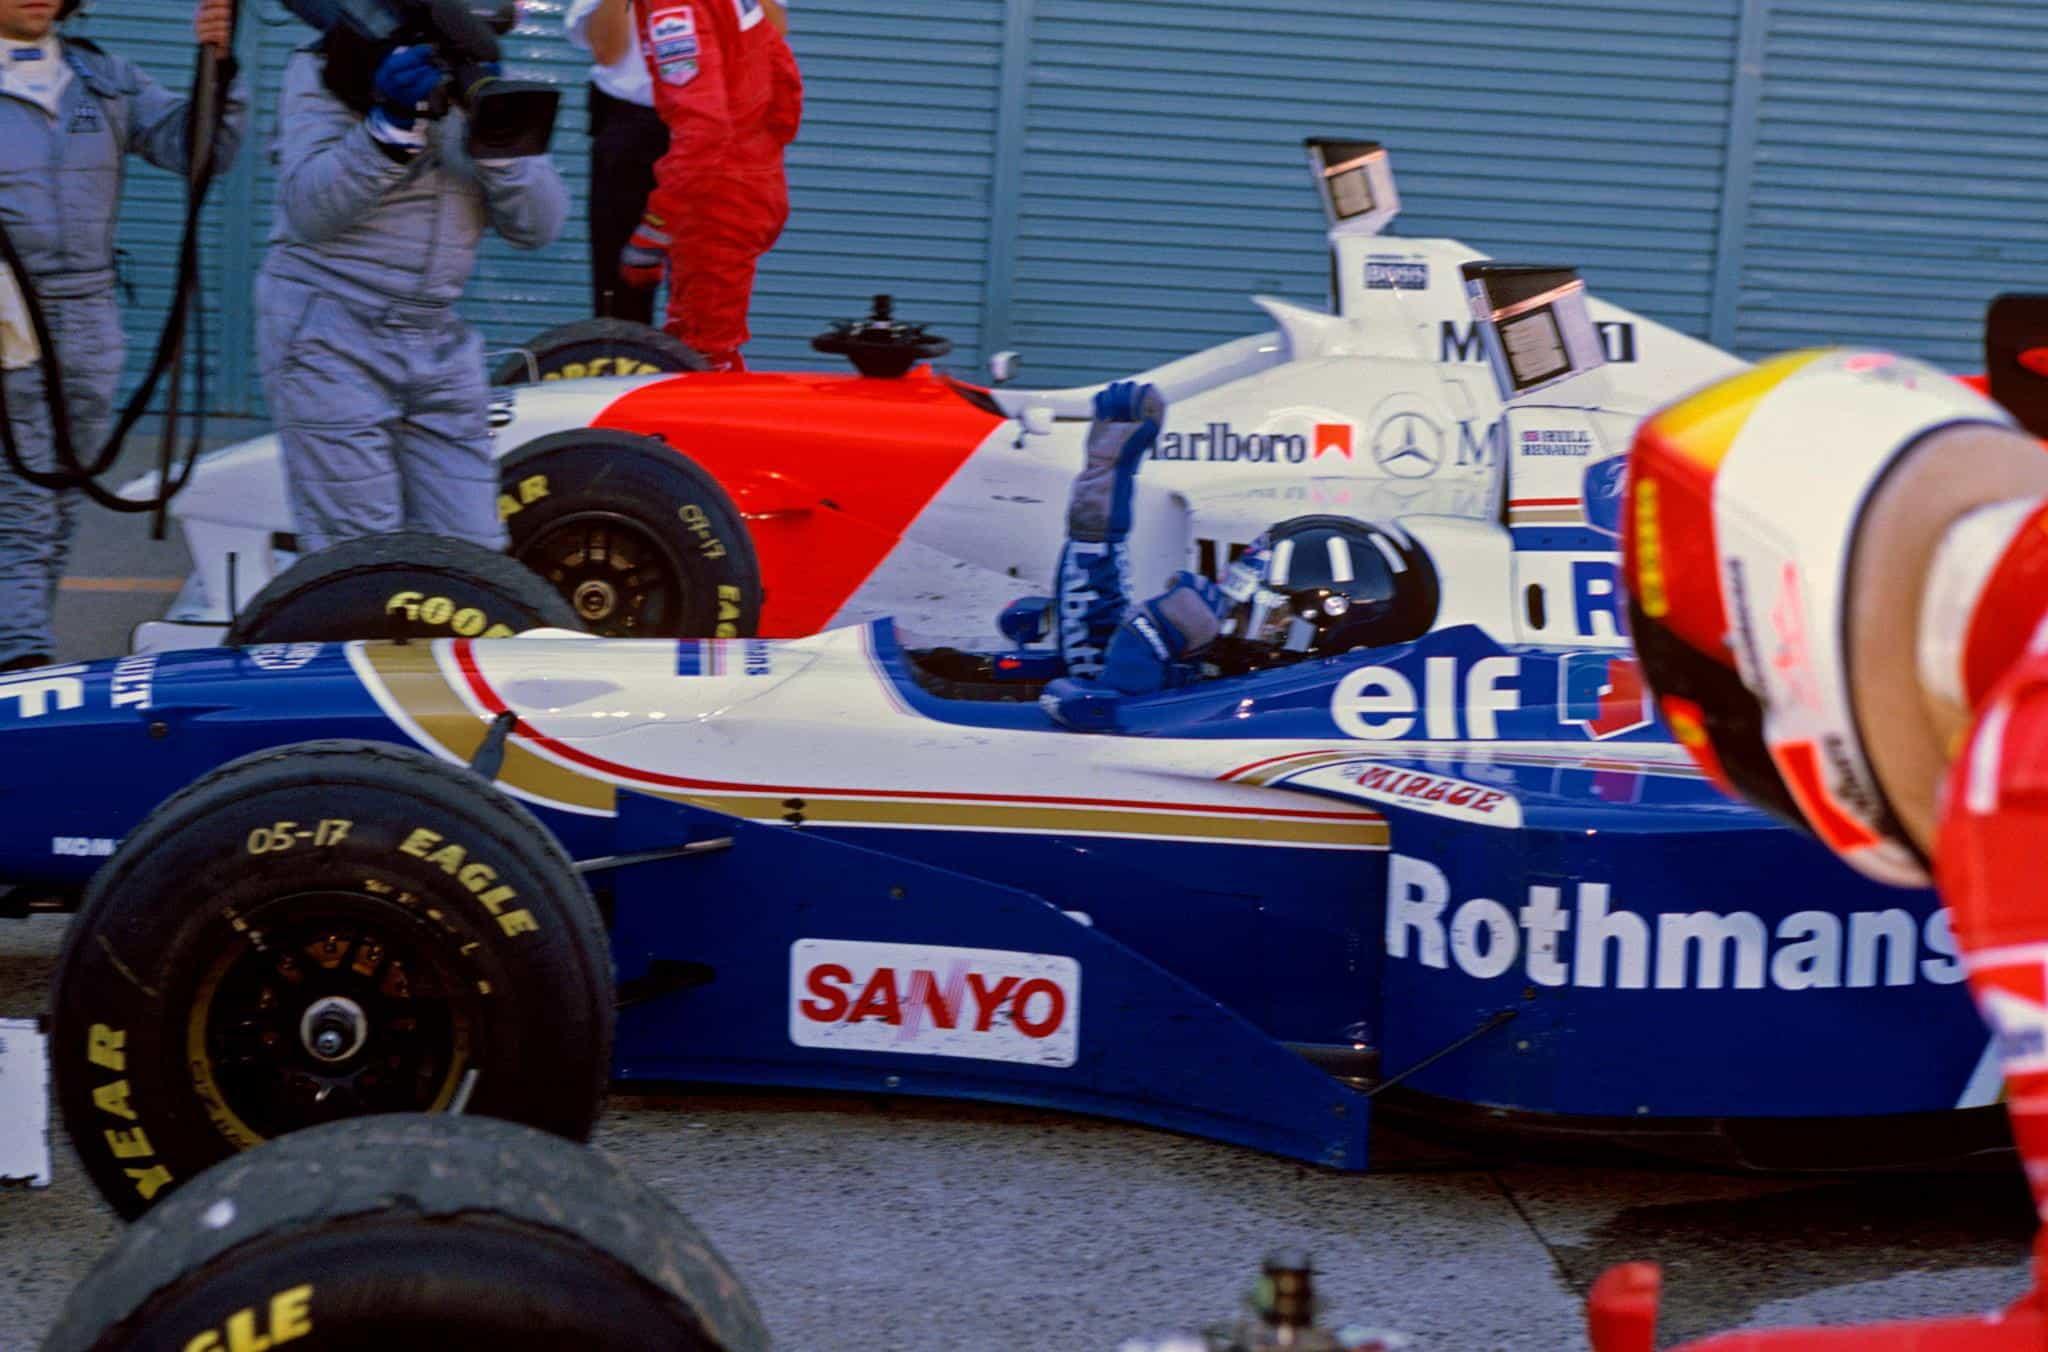 Hill Japanese GP 1996 Suzuka post race Photo Williams